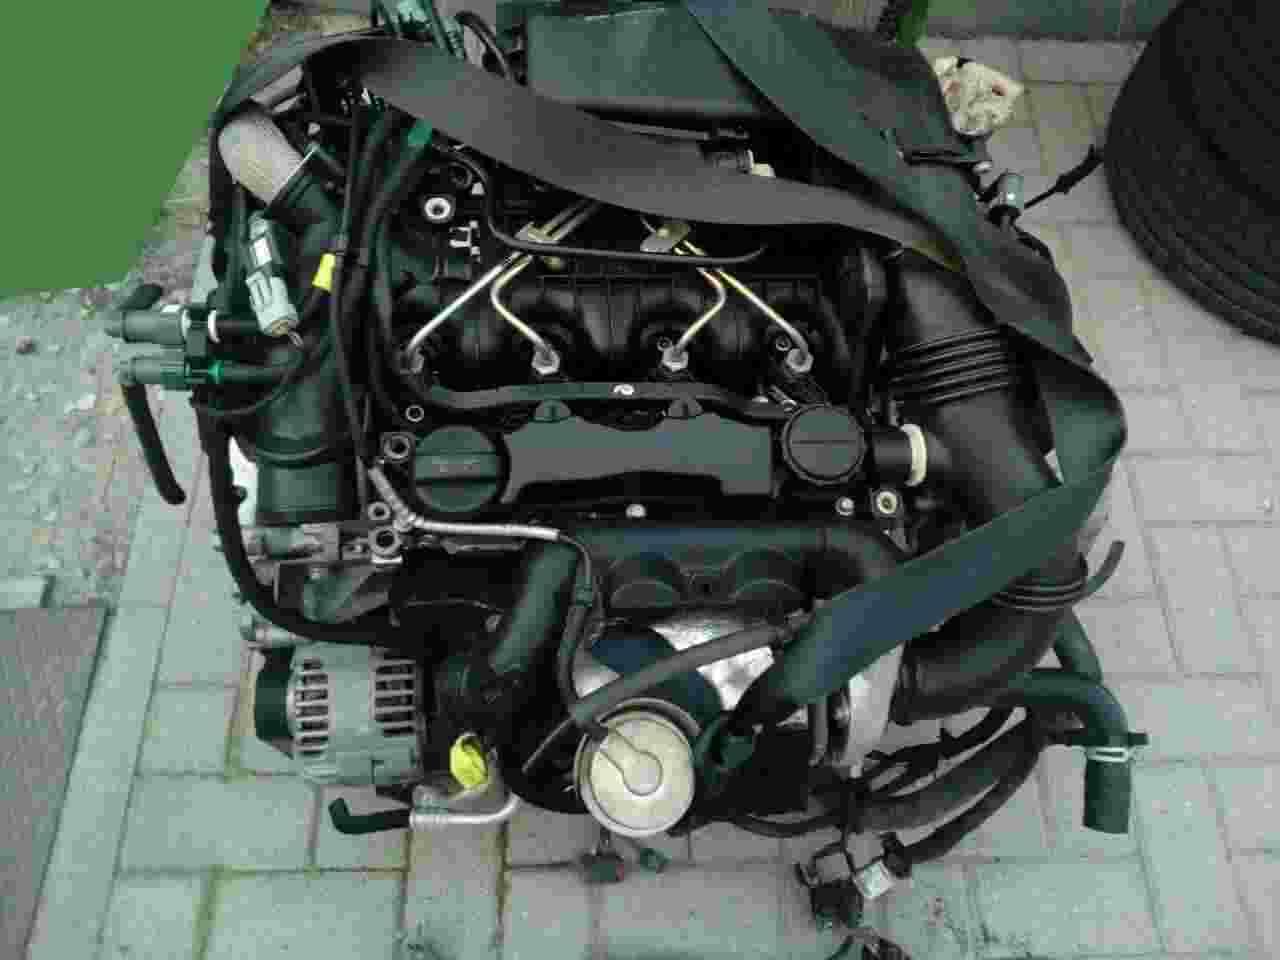 Motore Citroen C3 1400 HDI 16 valvole 8HY